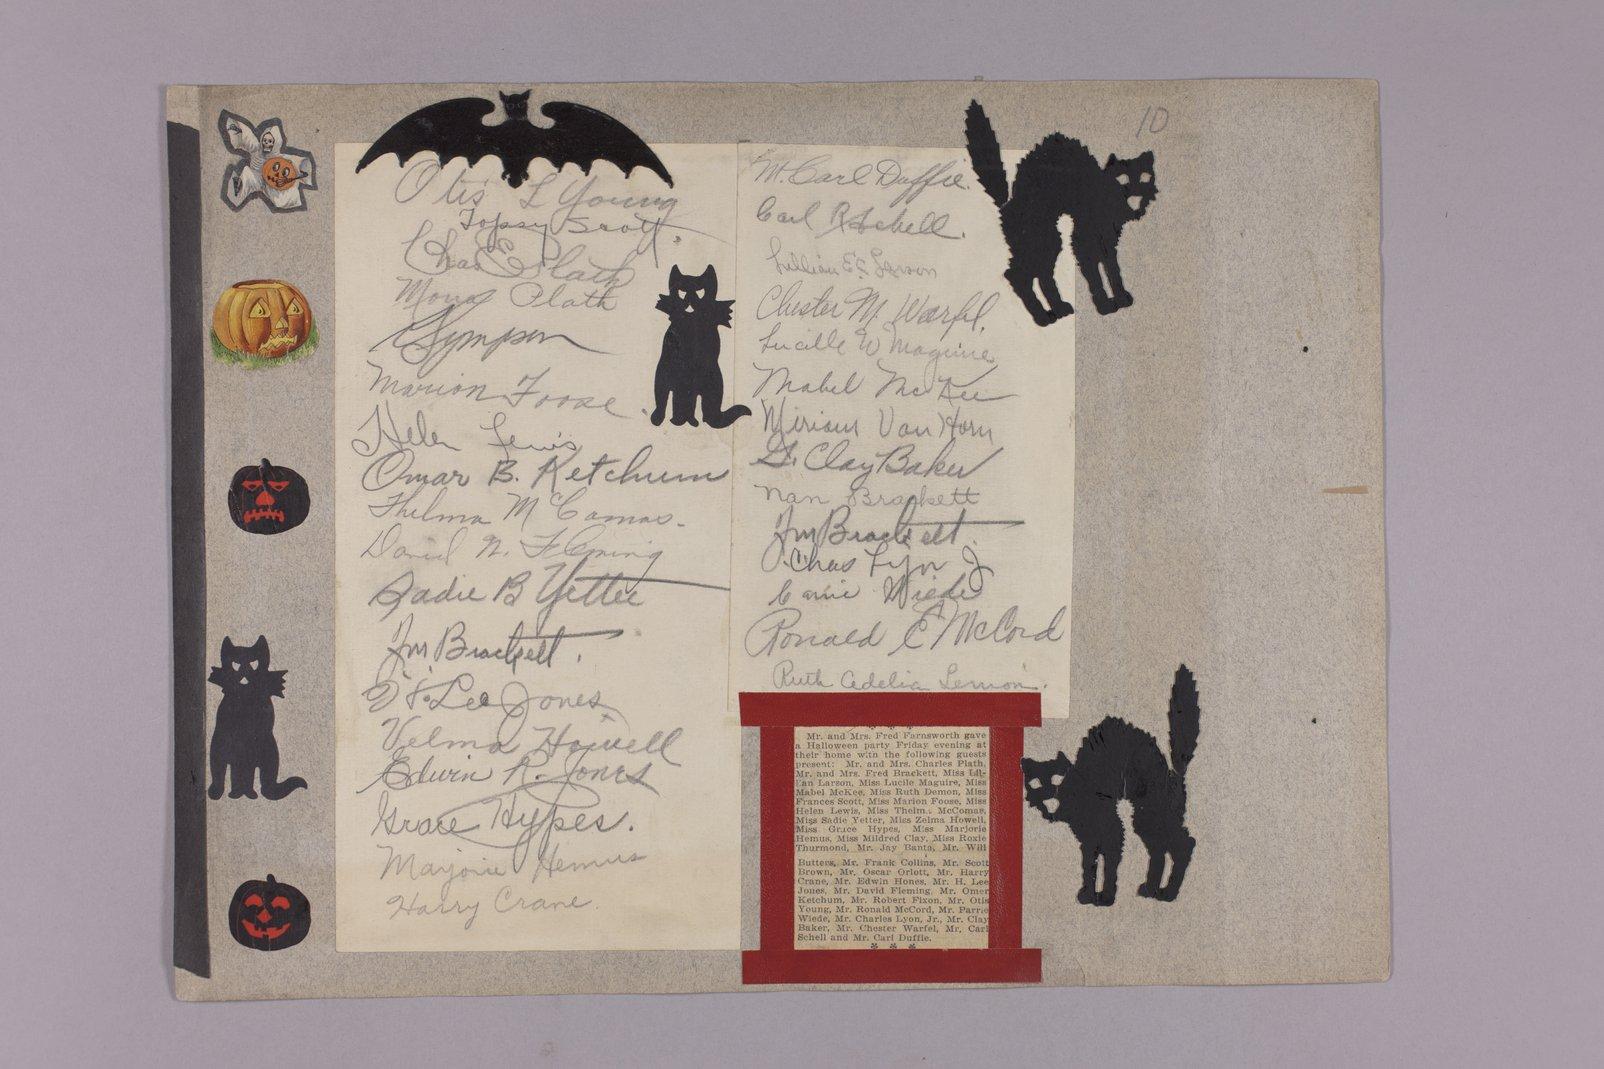 Martha Farnsworth scrapbook #4 - Newspaper article: Halloween party , Martha & Fred